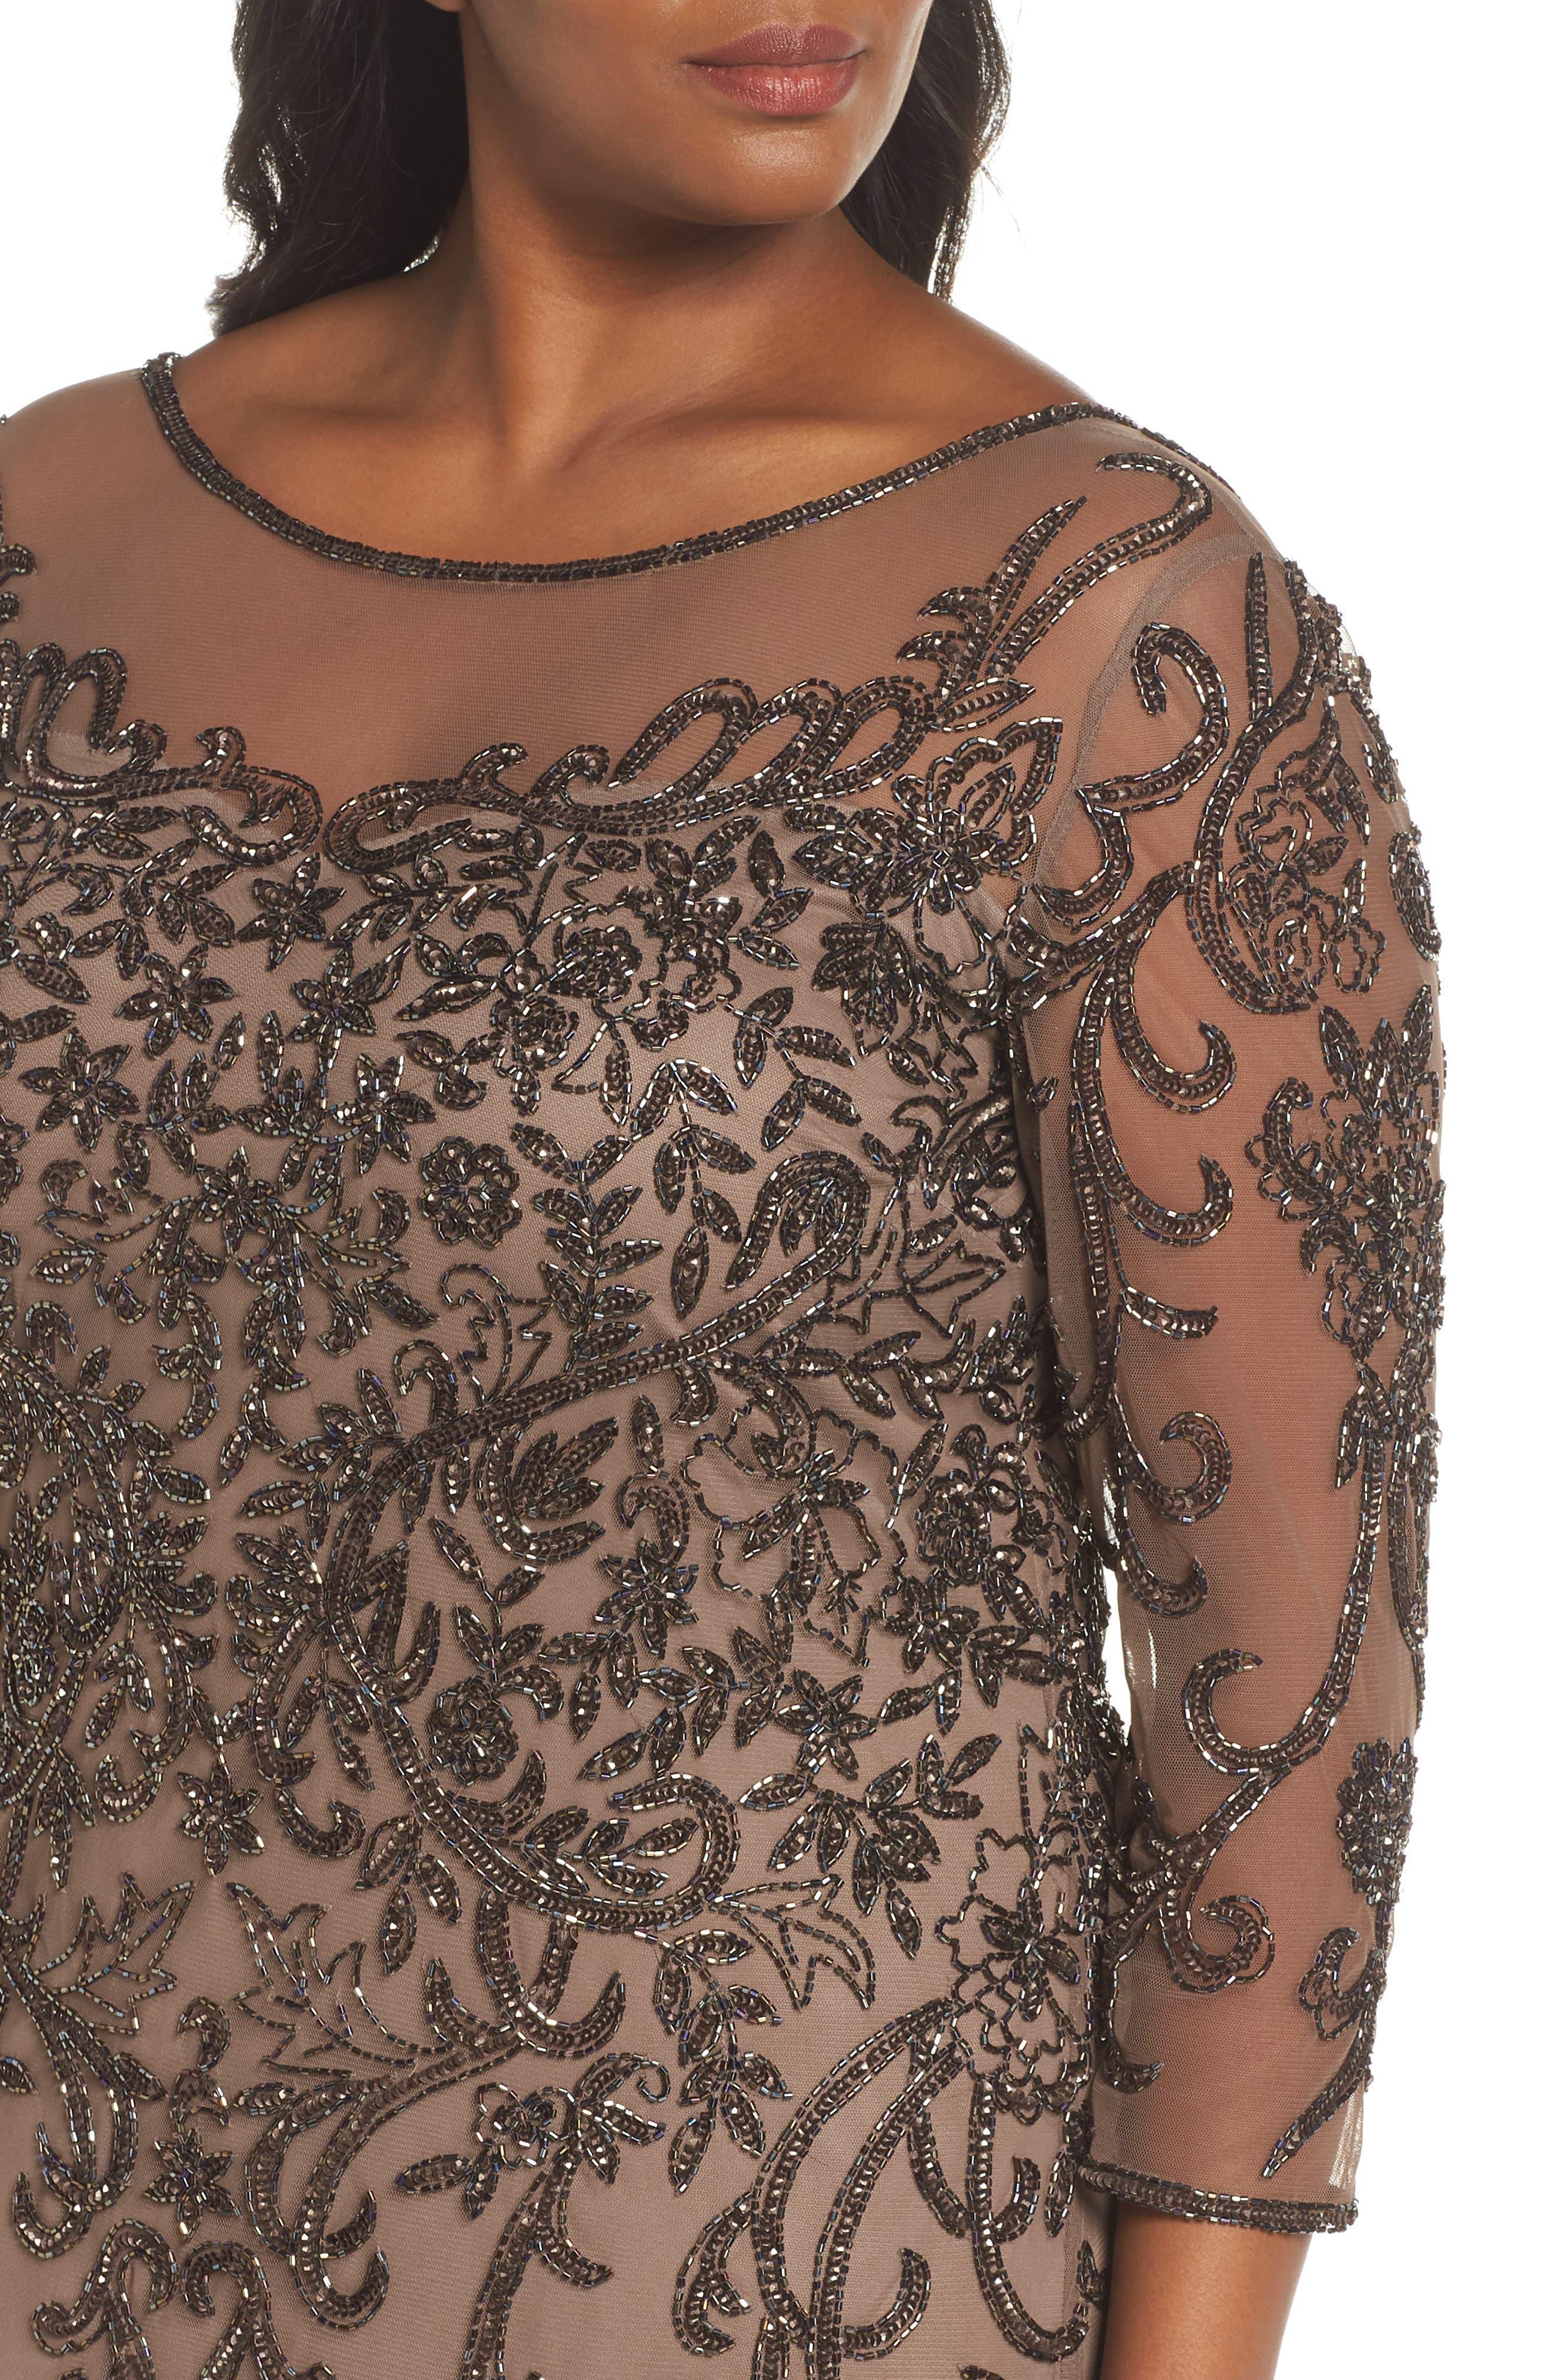 Illusion Sleeve Beaded Sheath Dress,                             Alternate thumbnail 4, color,                             BROWN/ GOLD